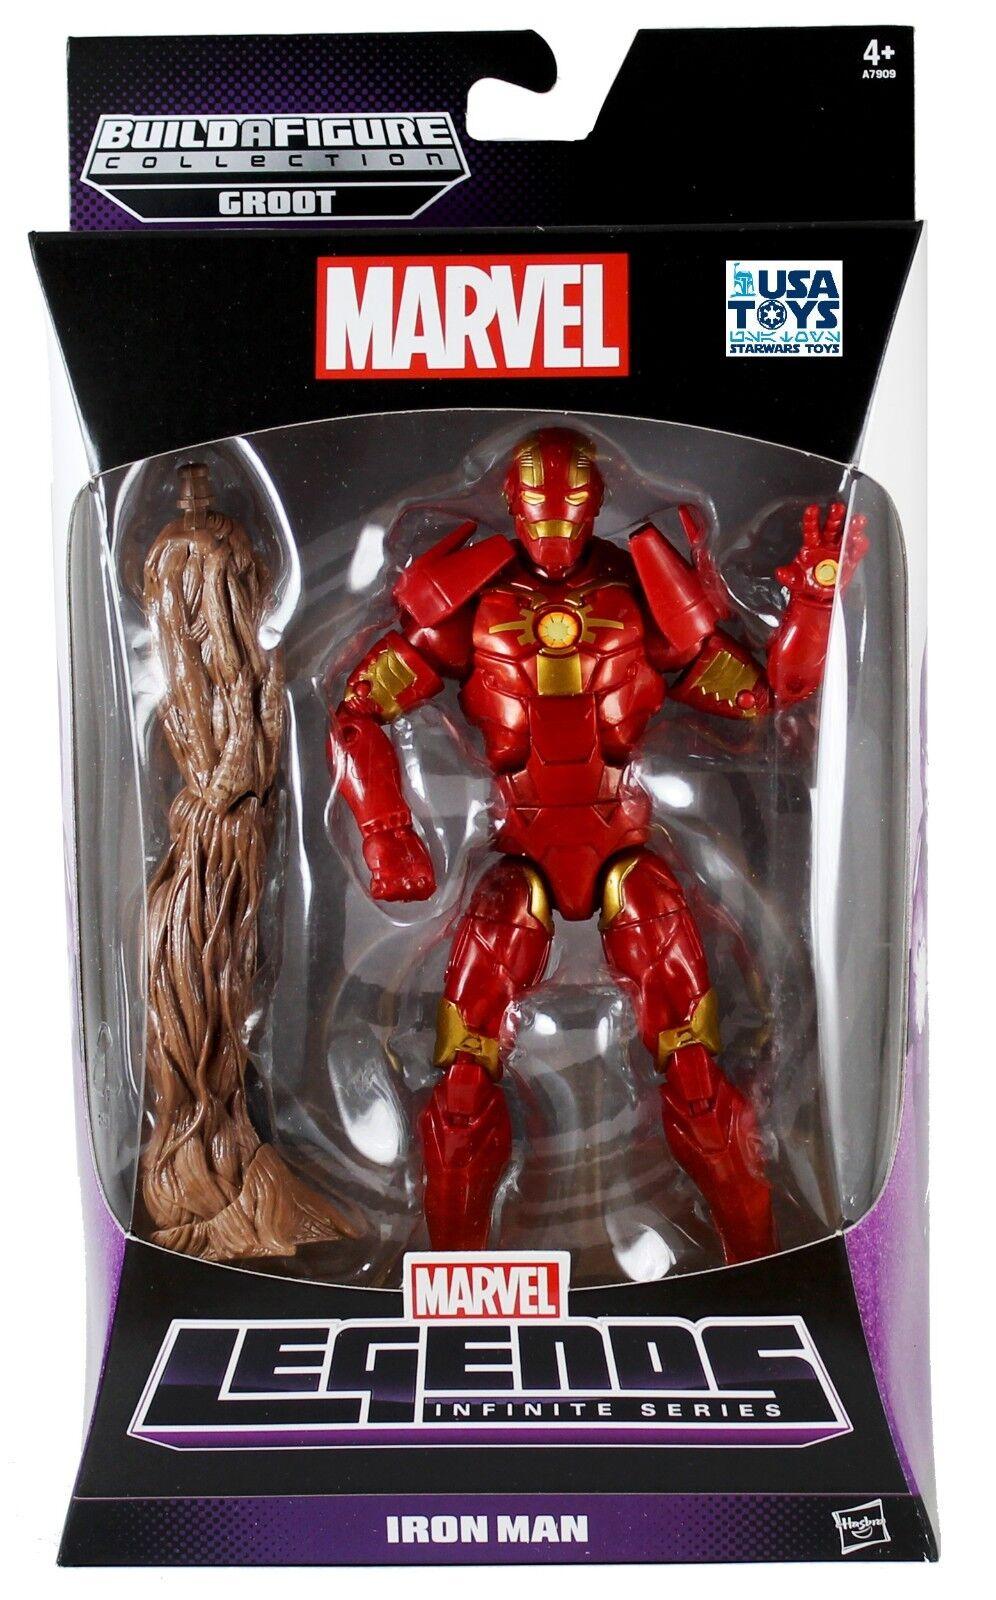 MARVEL Legends Infinite Series IRON MAN Platinum Build GROOT Guardians MISB